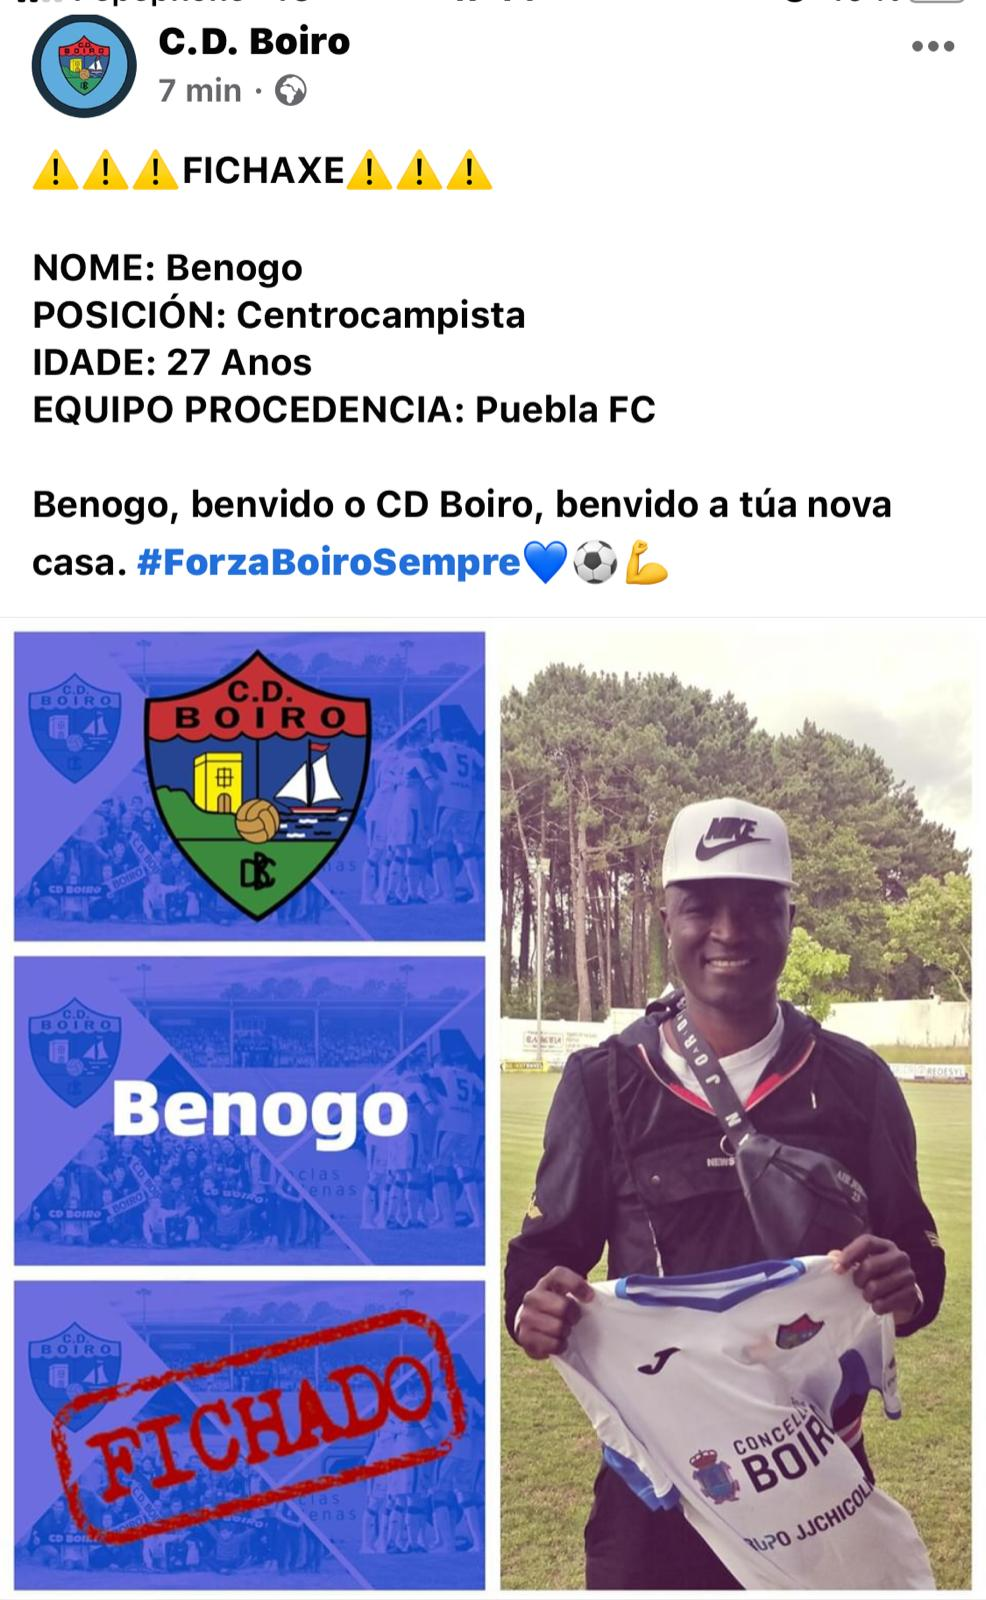 BENOGO FICHA POLO C.D.BOIRO .